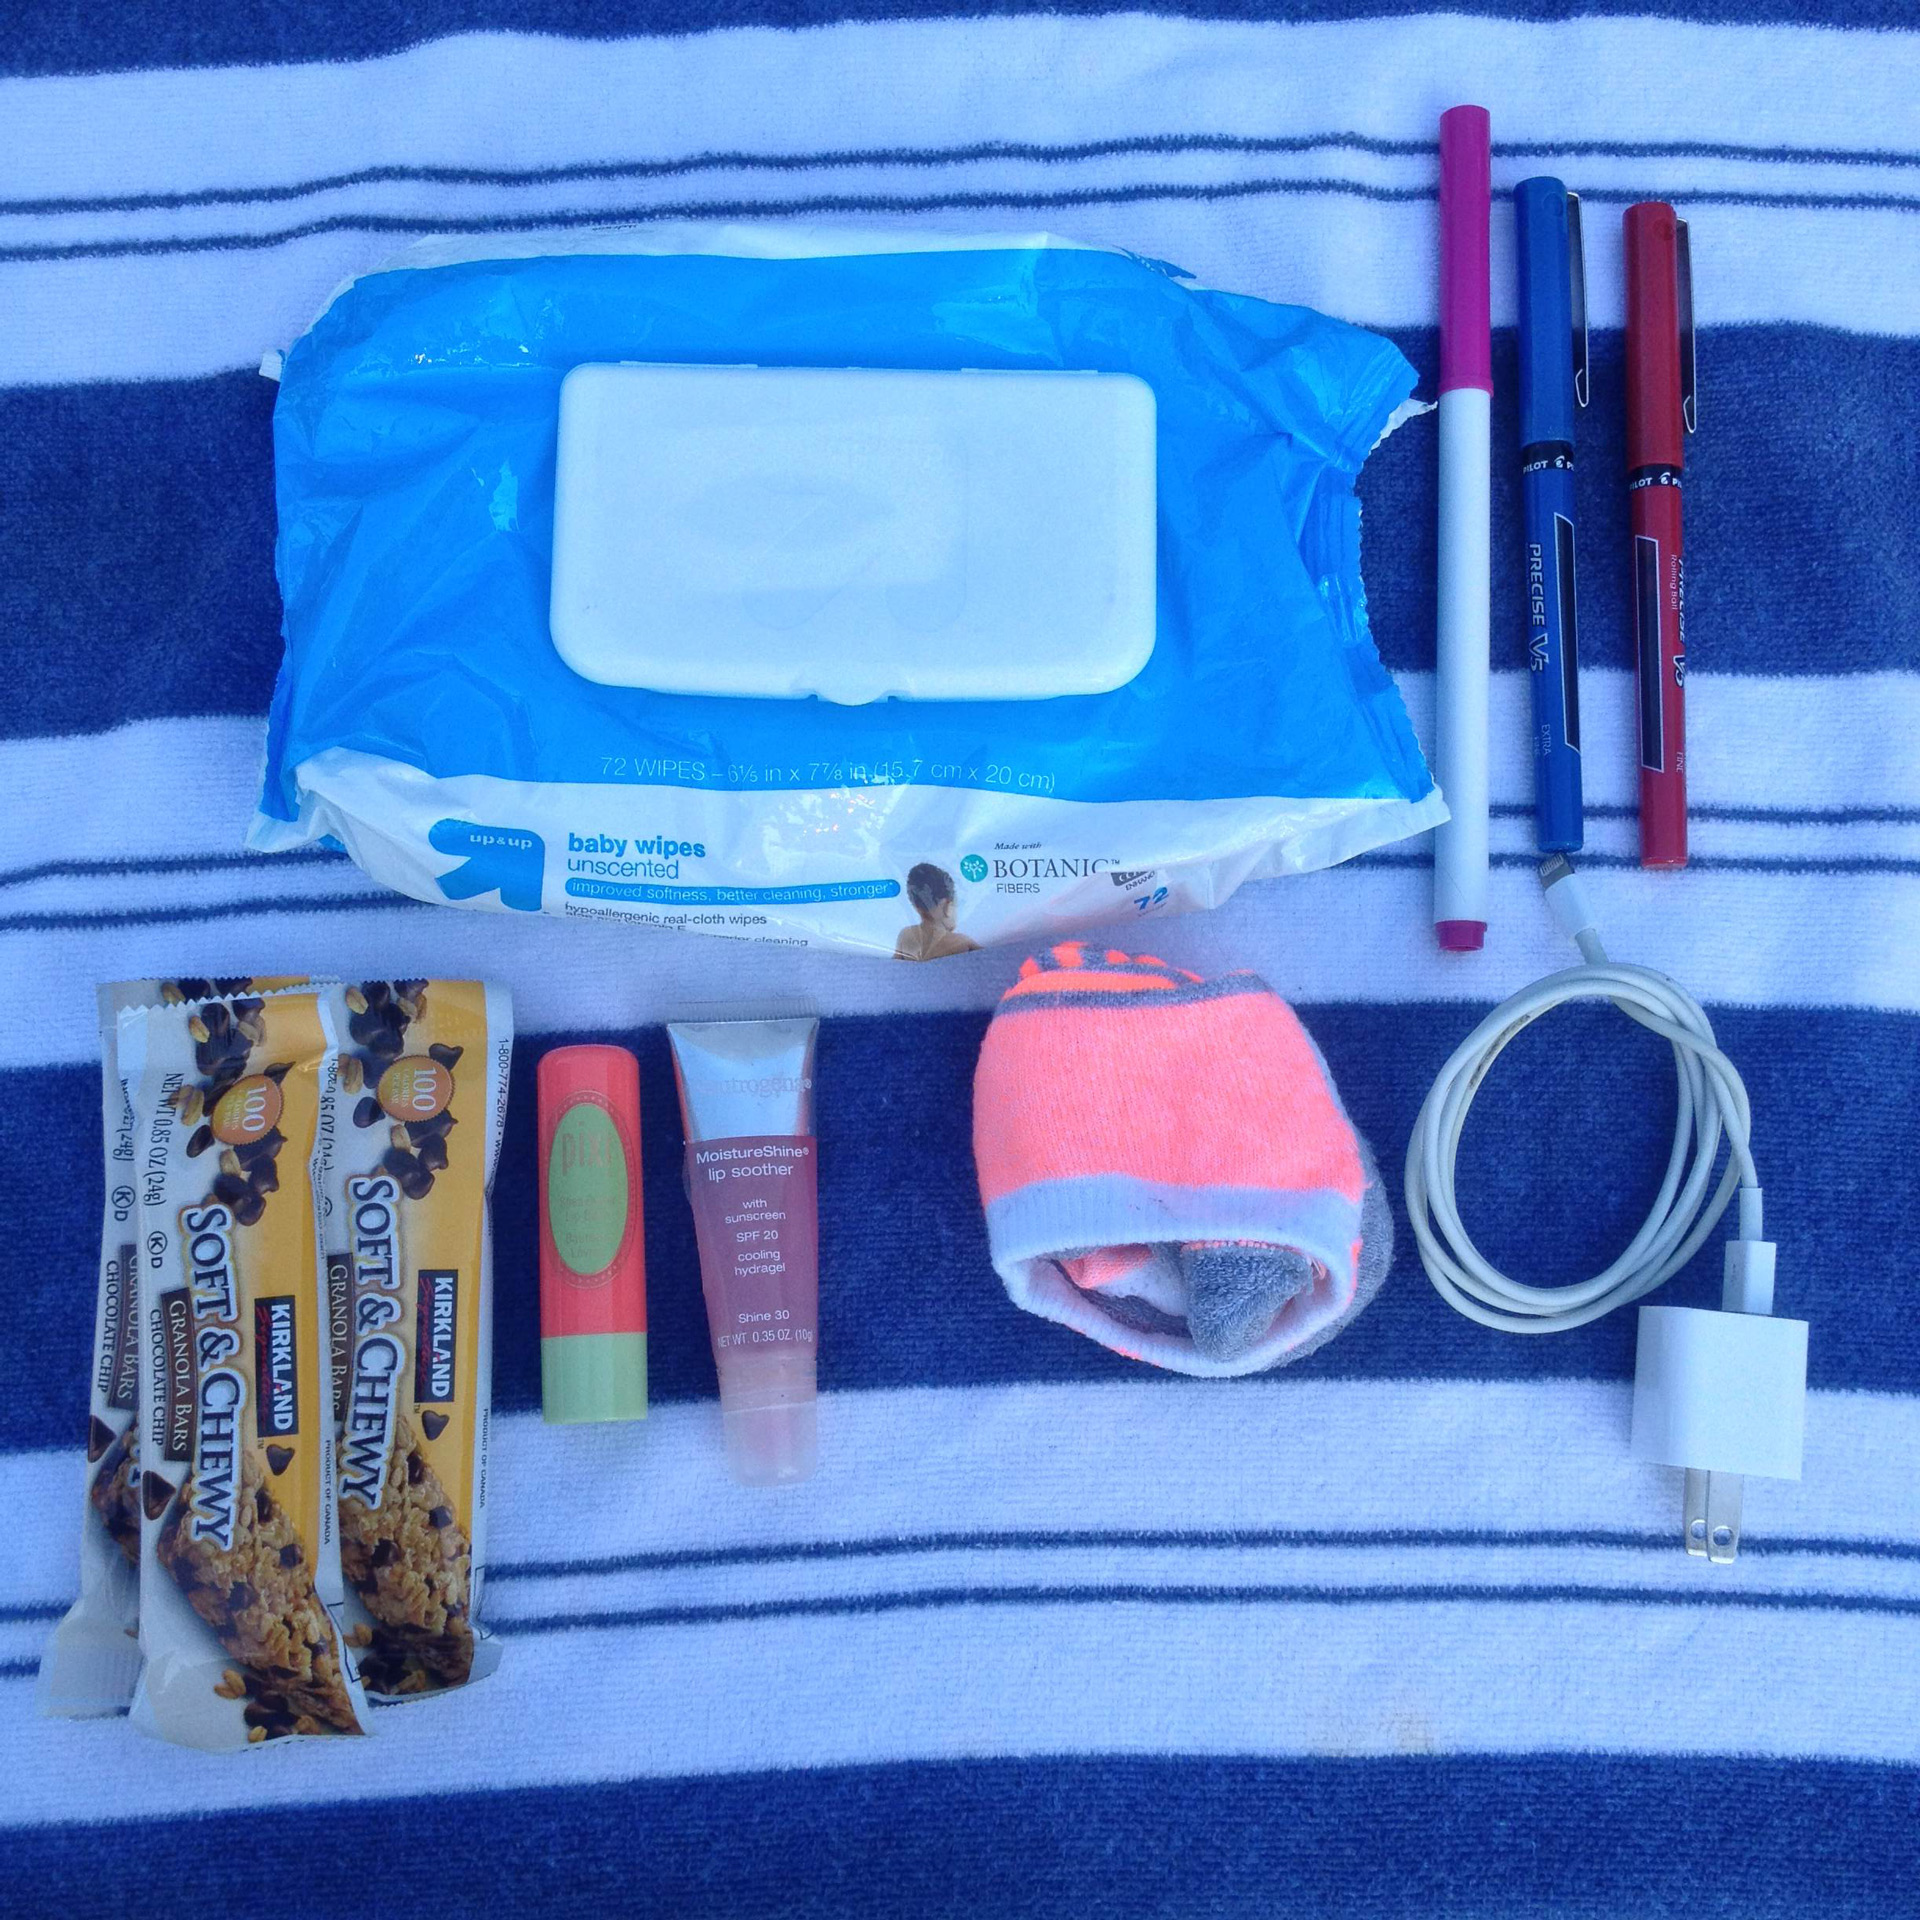 Katie Kavulla's purse | Sheknows.com